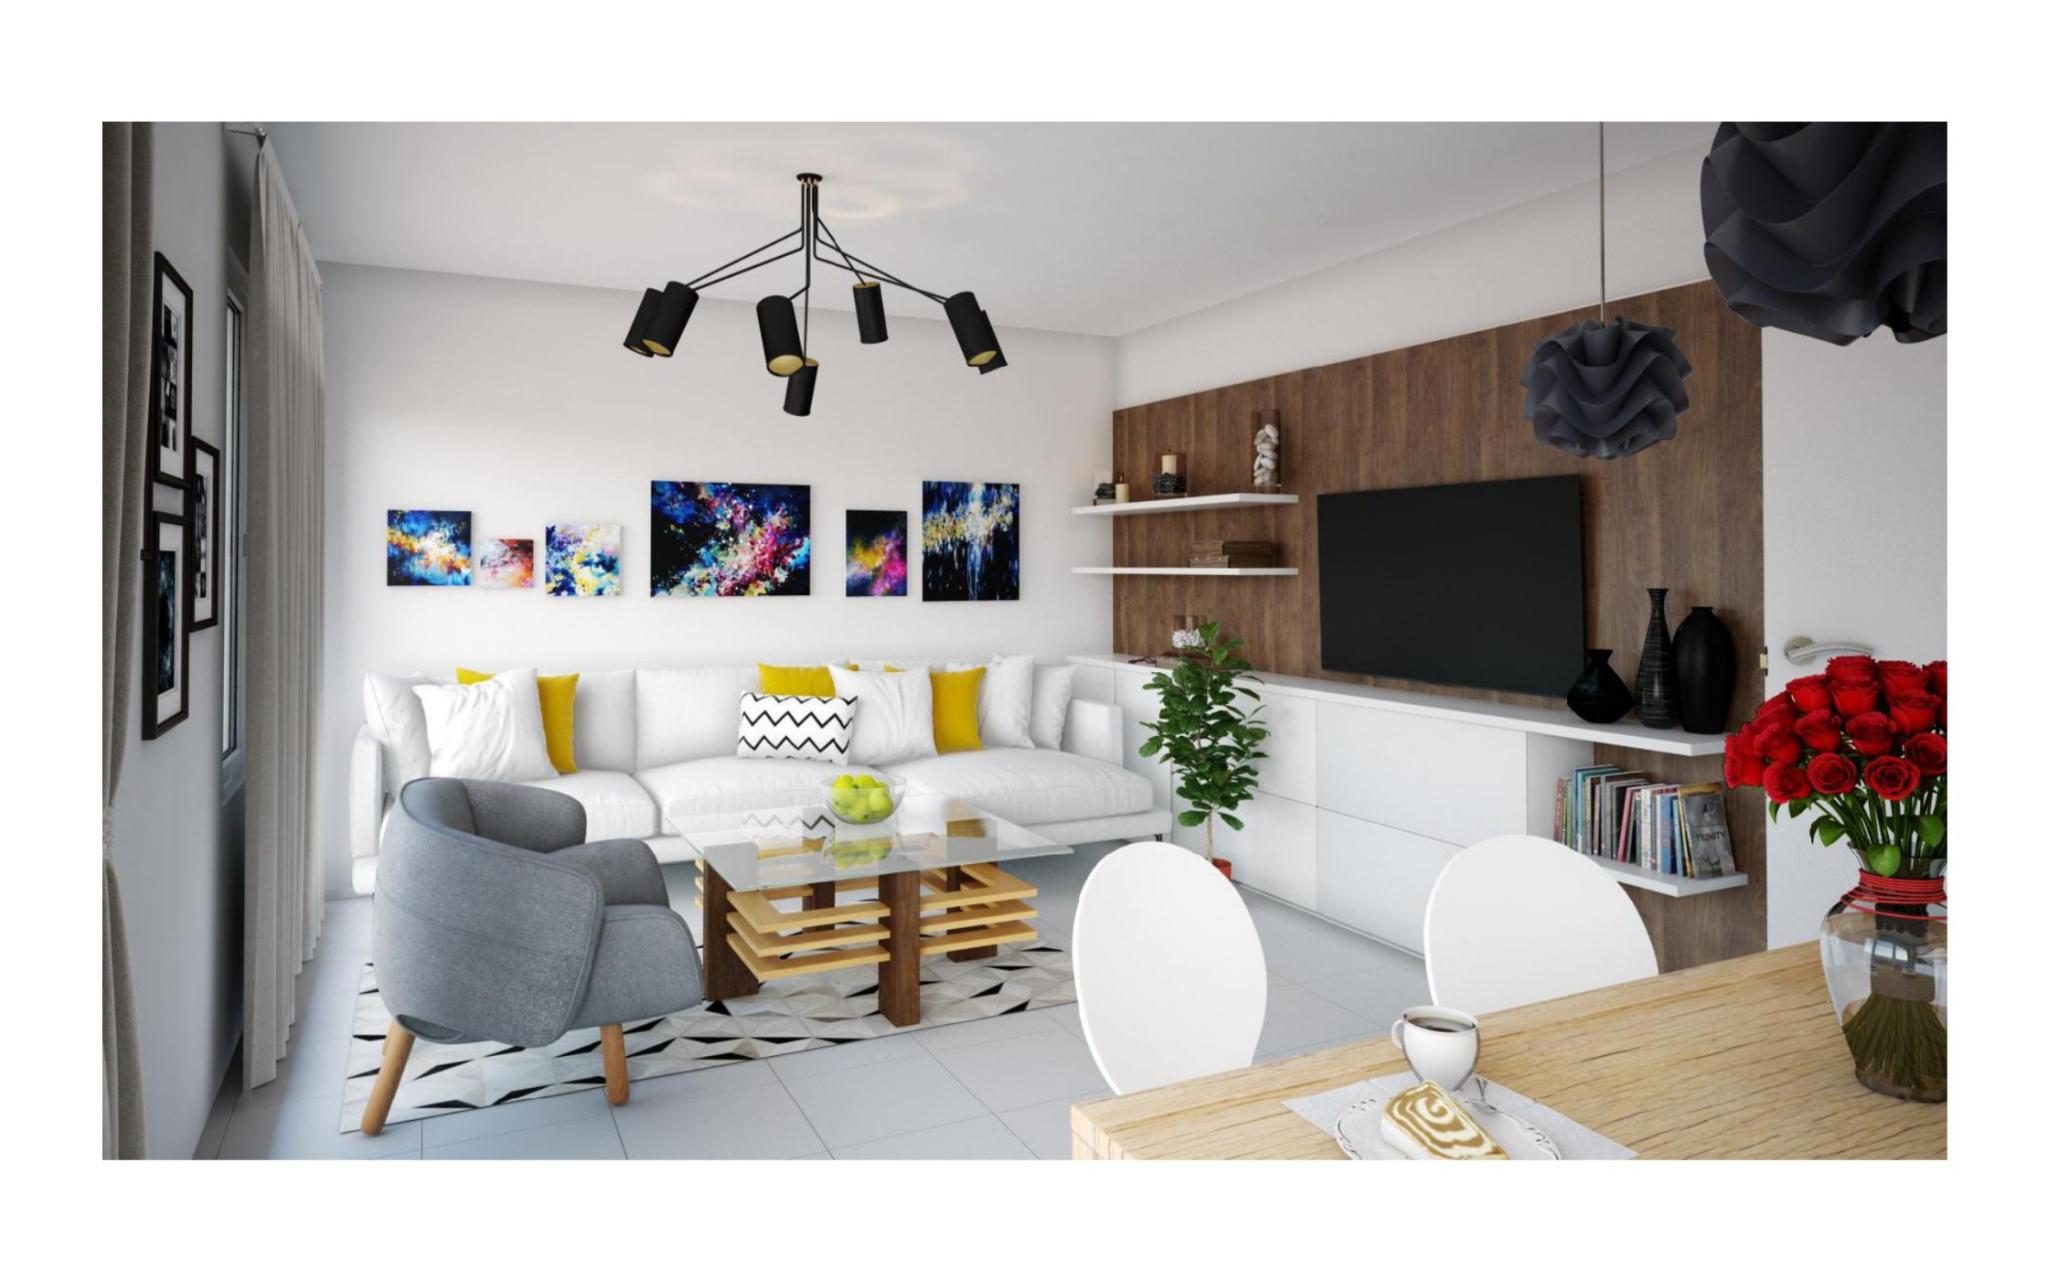 T3 Neuf Ajaccio Mezzavia Les Terrasses du Stiletto - Salon